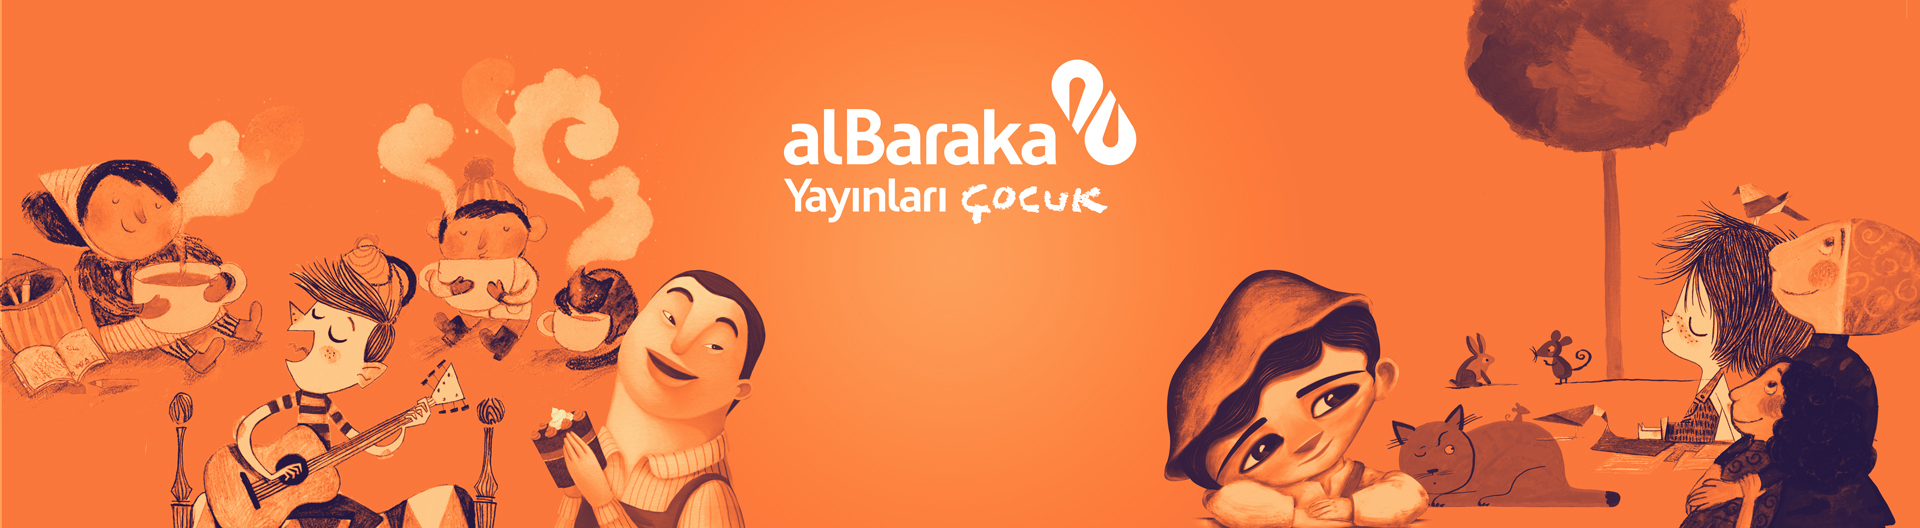 Albaraka Kültür Sanat